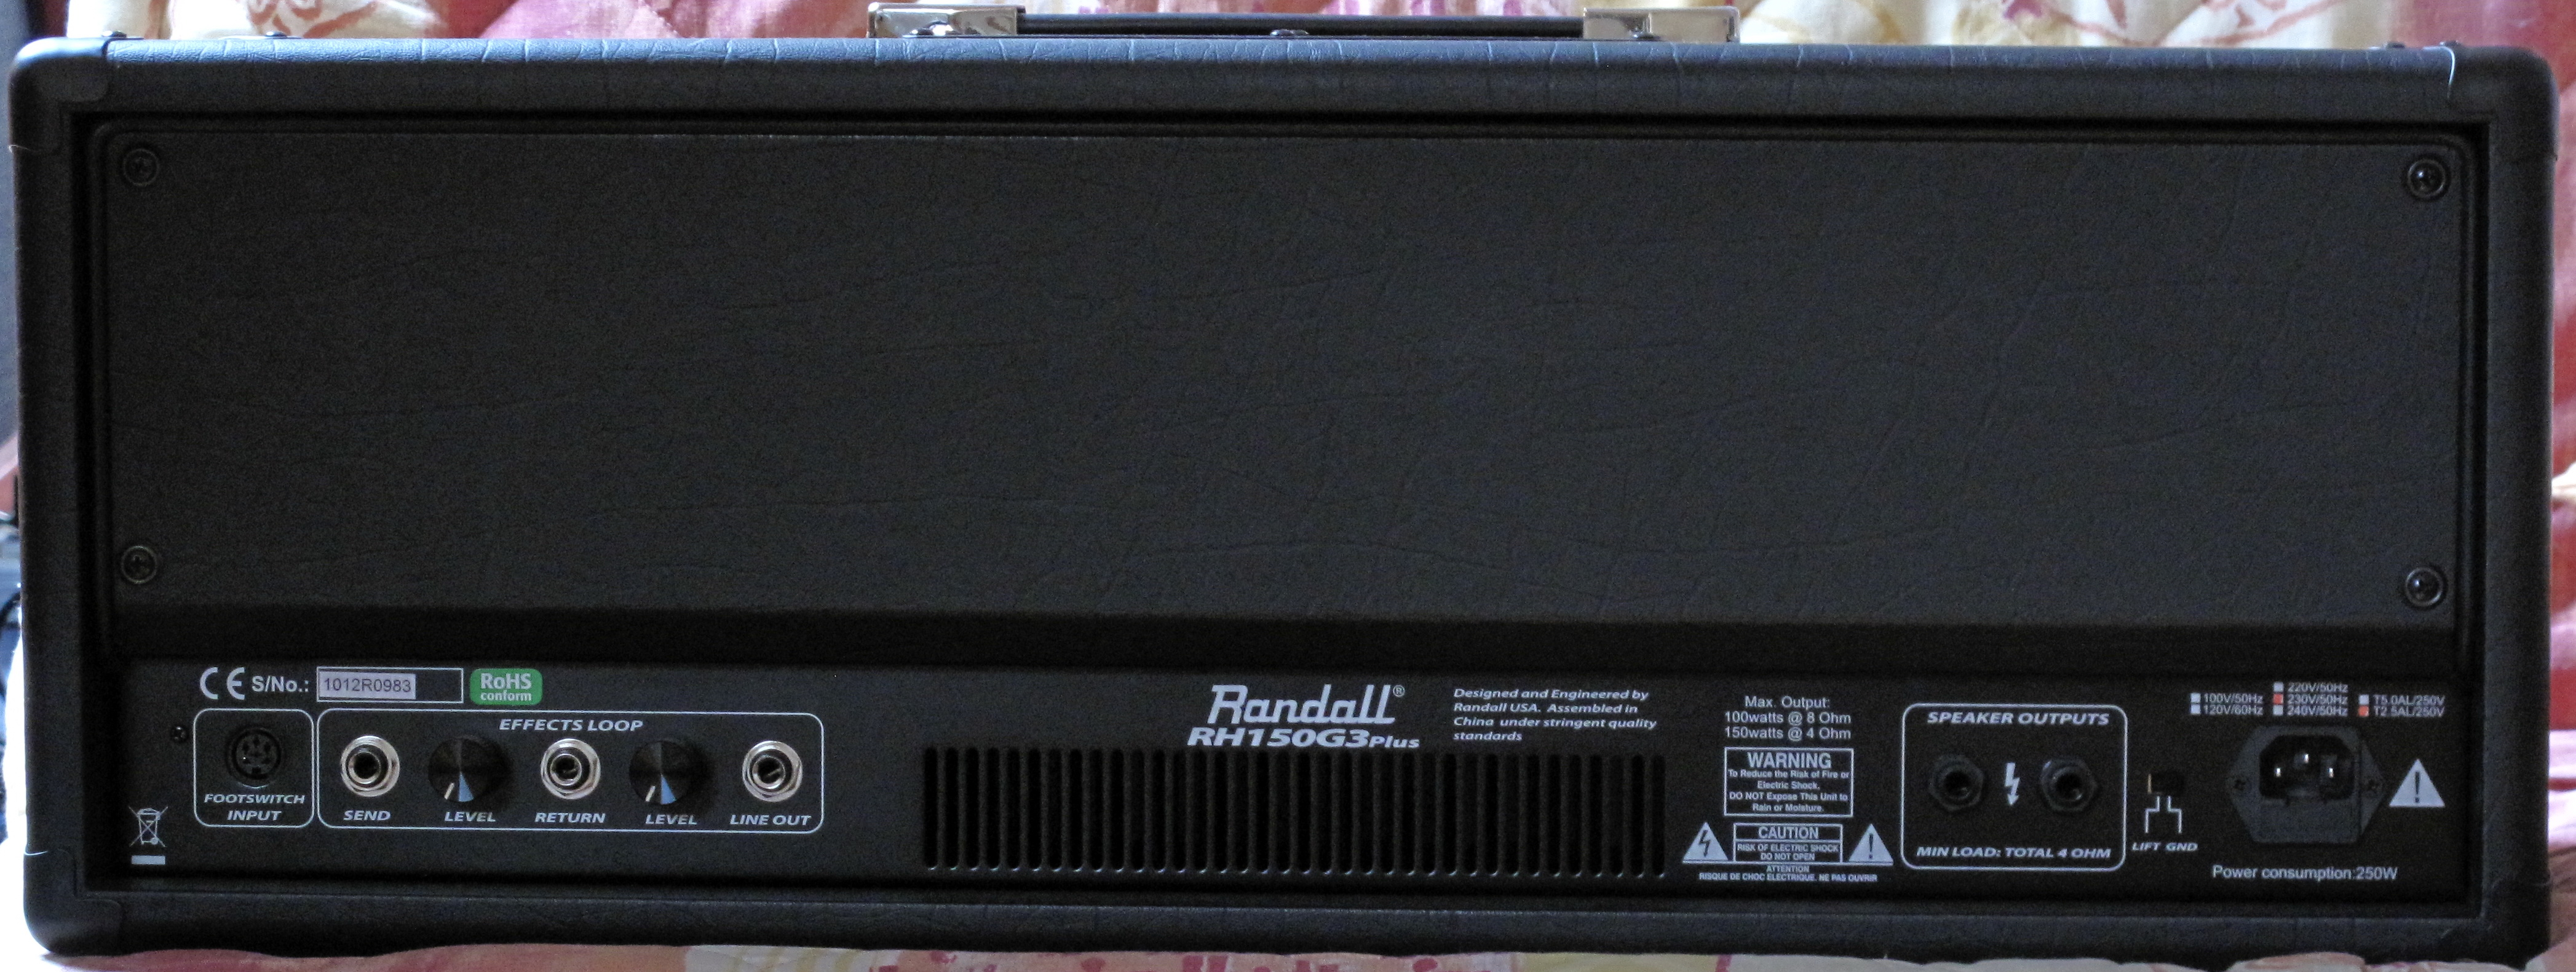 randall-rh-150-g3-plus-251703.jpg